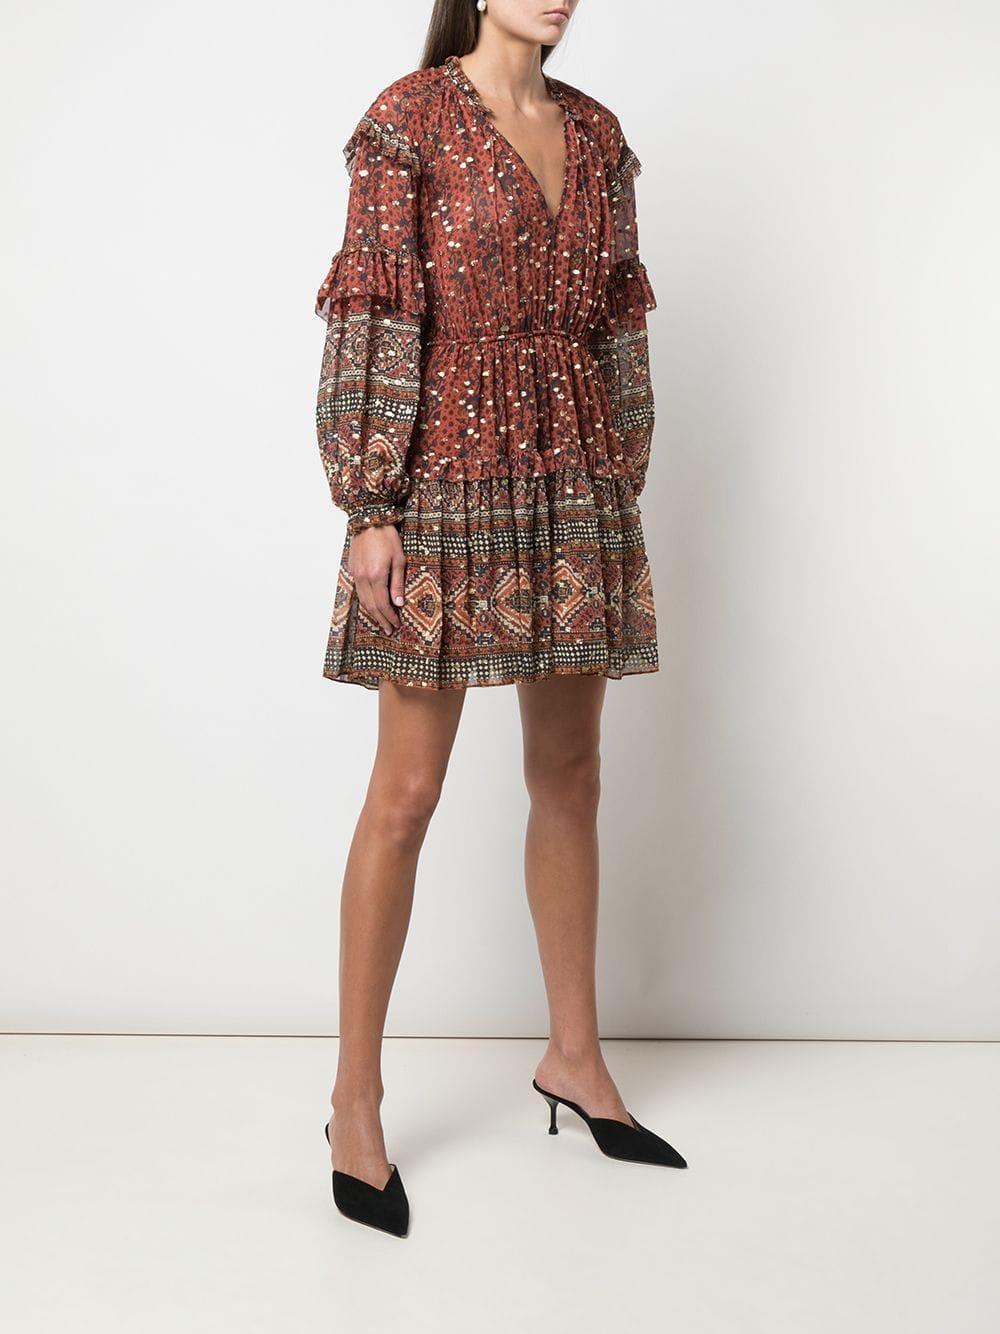 Vestido corto con estampado bohemio Ulla Johnson de Seda de color Rojo